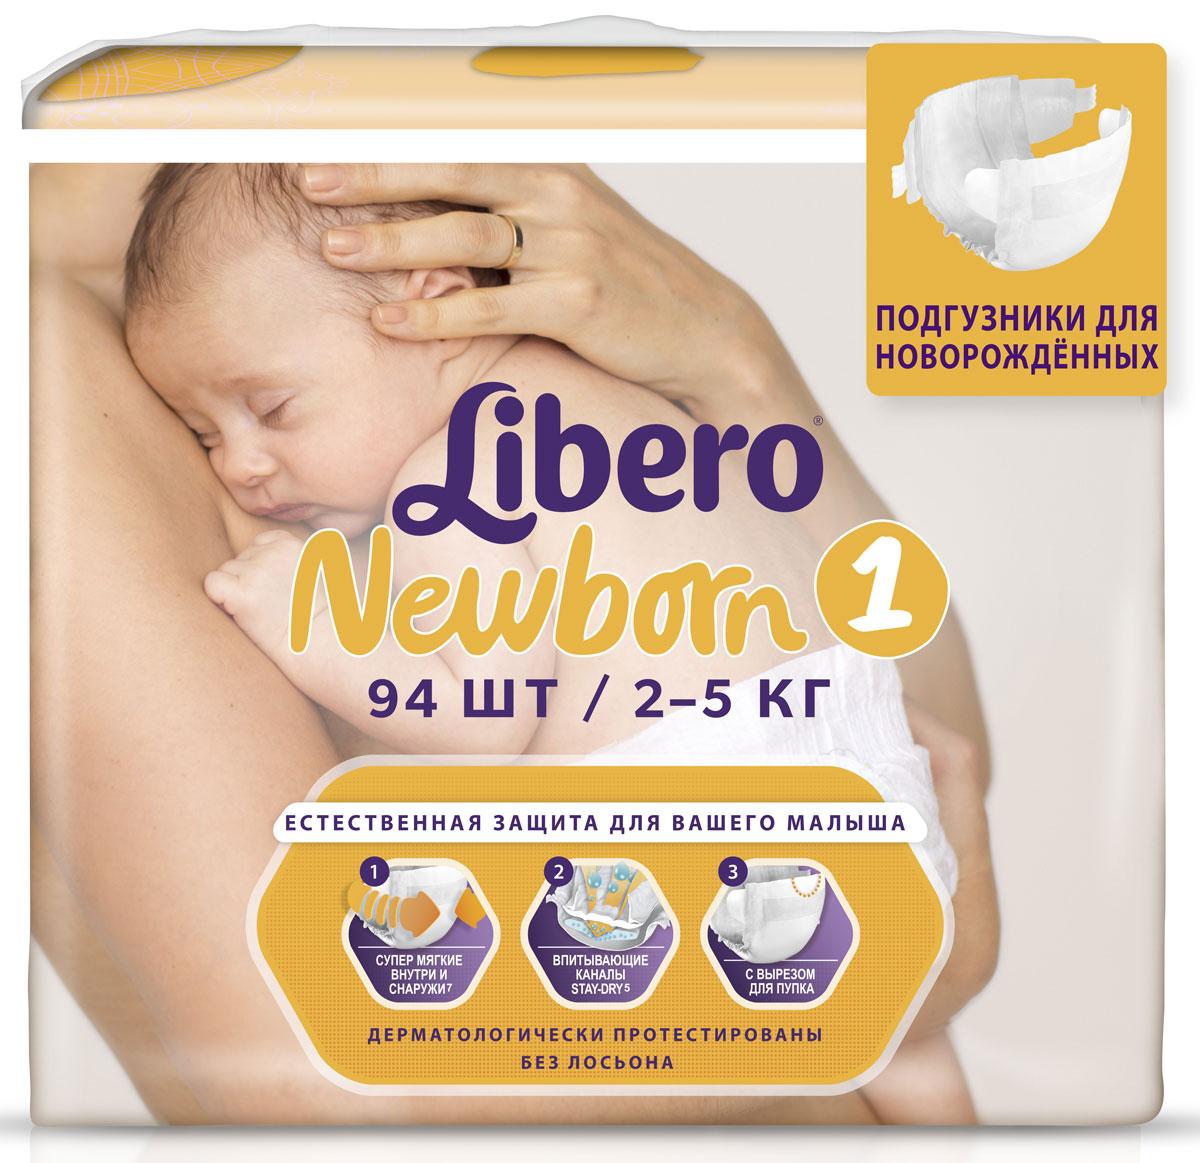 Libero Подгузники Newborn Size 1 (2-5 кг) 94 шт подгузники libero newborn 1 2 5 кг 94 шт